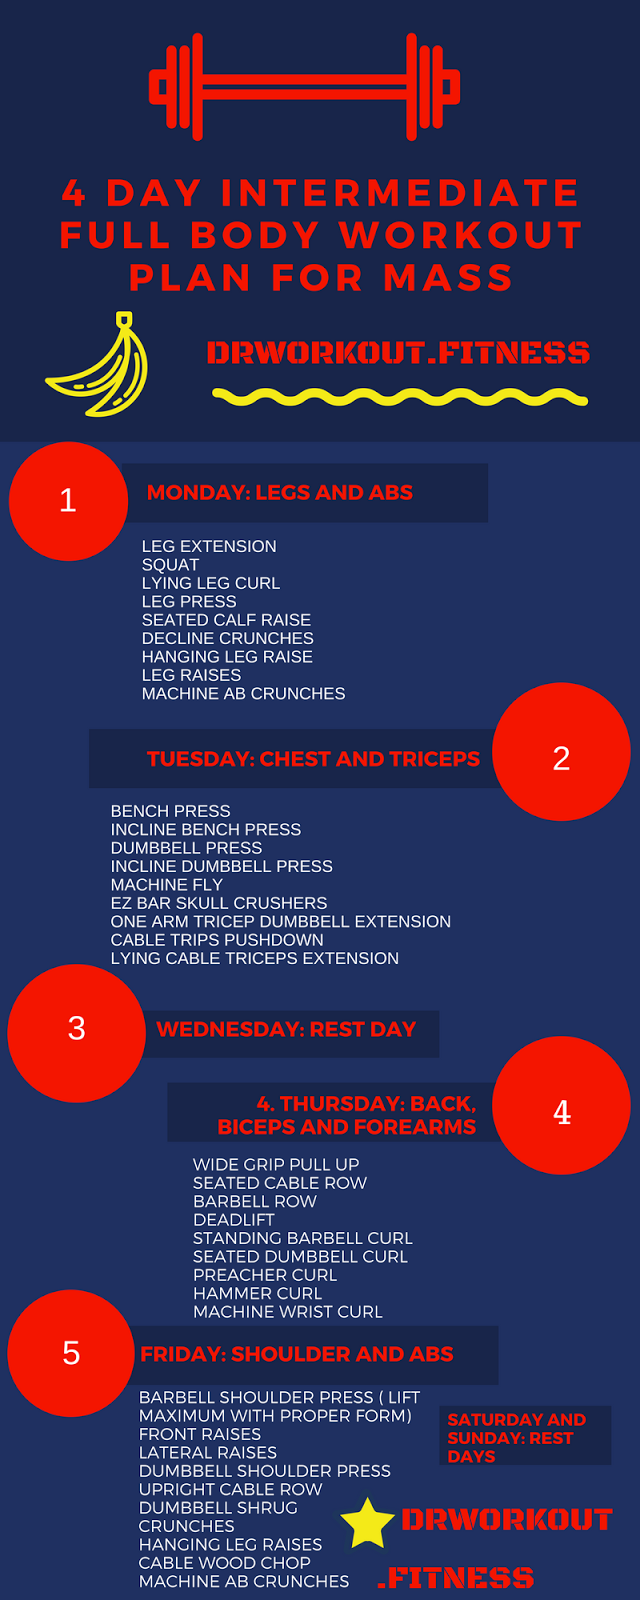 4 Day Intermediate Full Body Workout Plan For Mass Bodybuilding Fitness Gym Workoutplan Workoutroutine Life Health Lifestyle